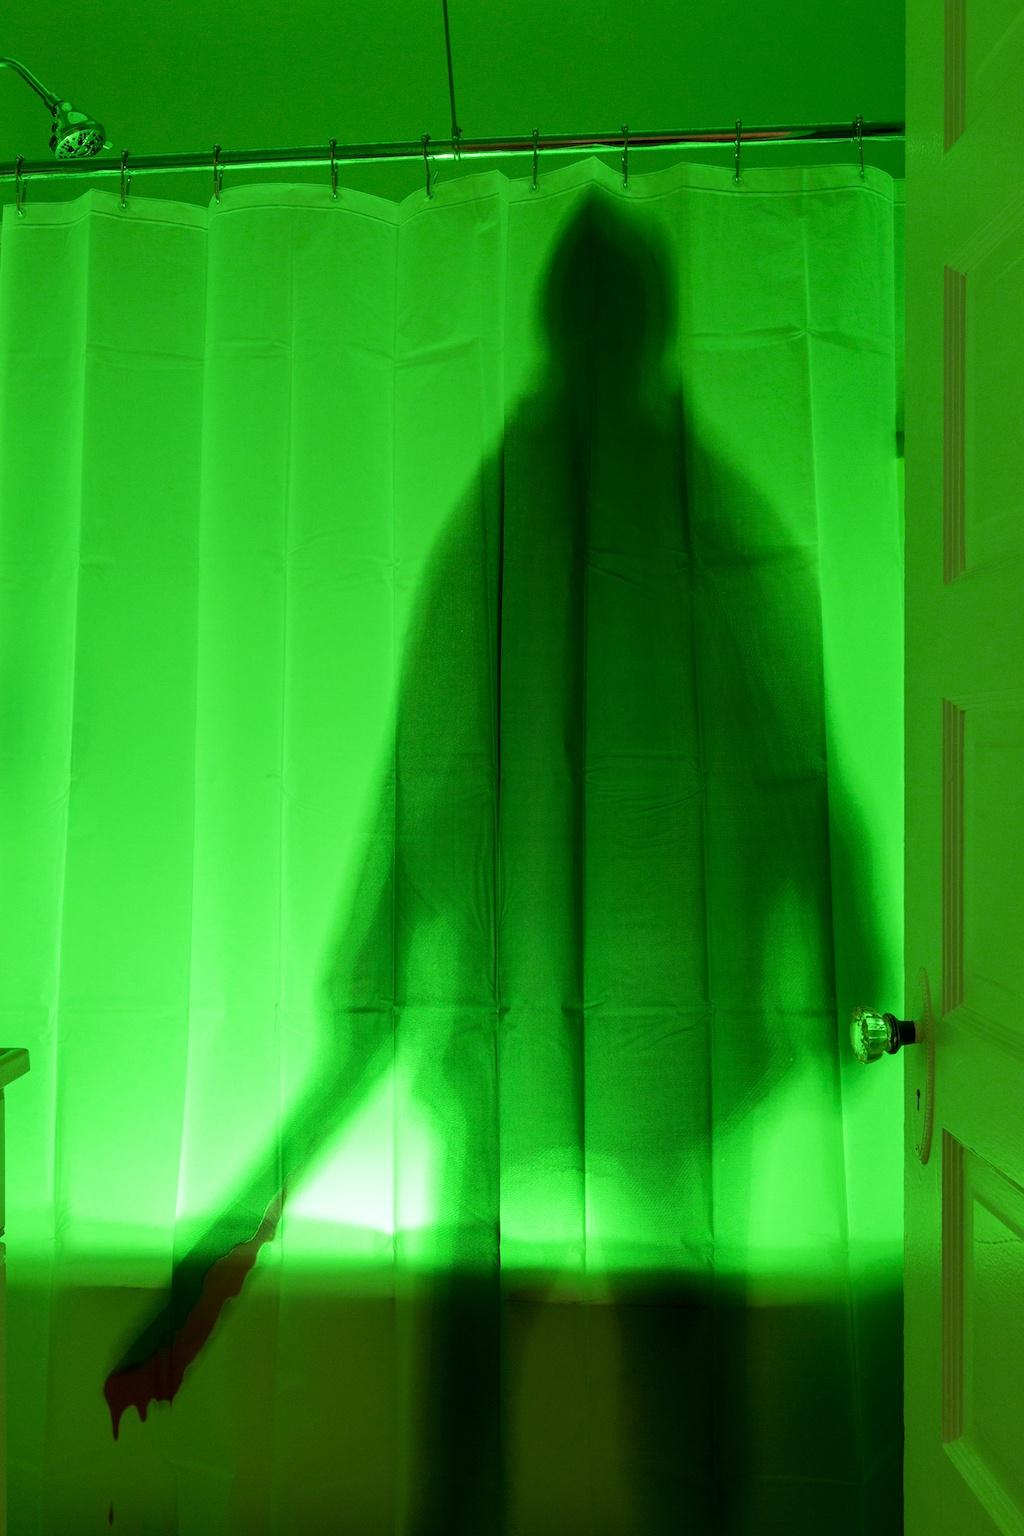 Phillips hue glow light in bathtub